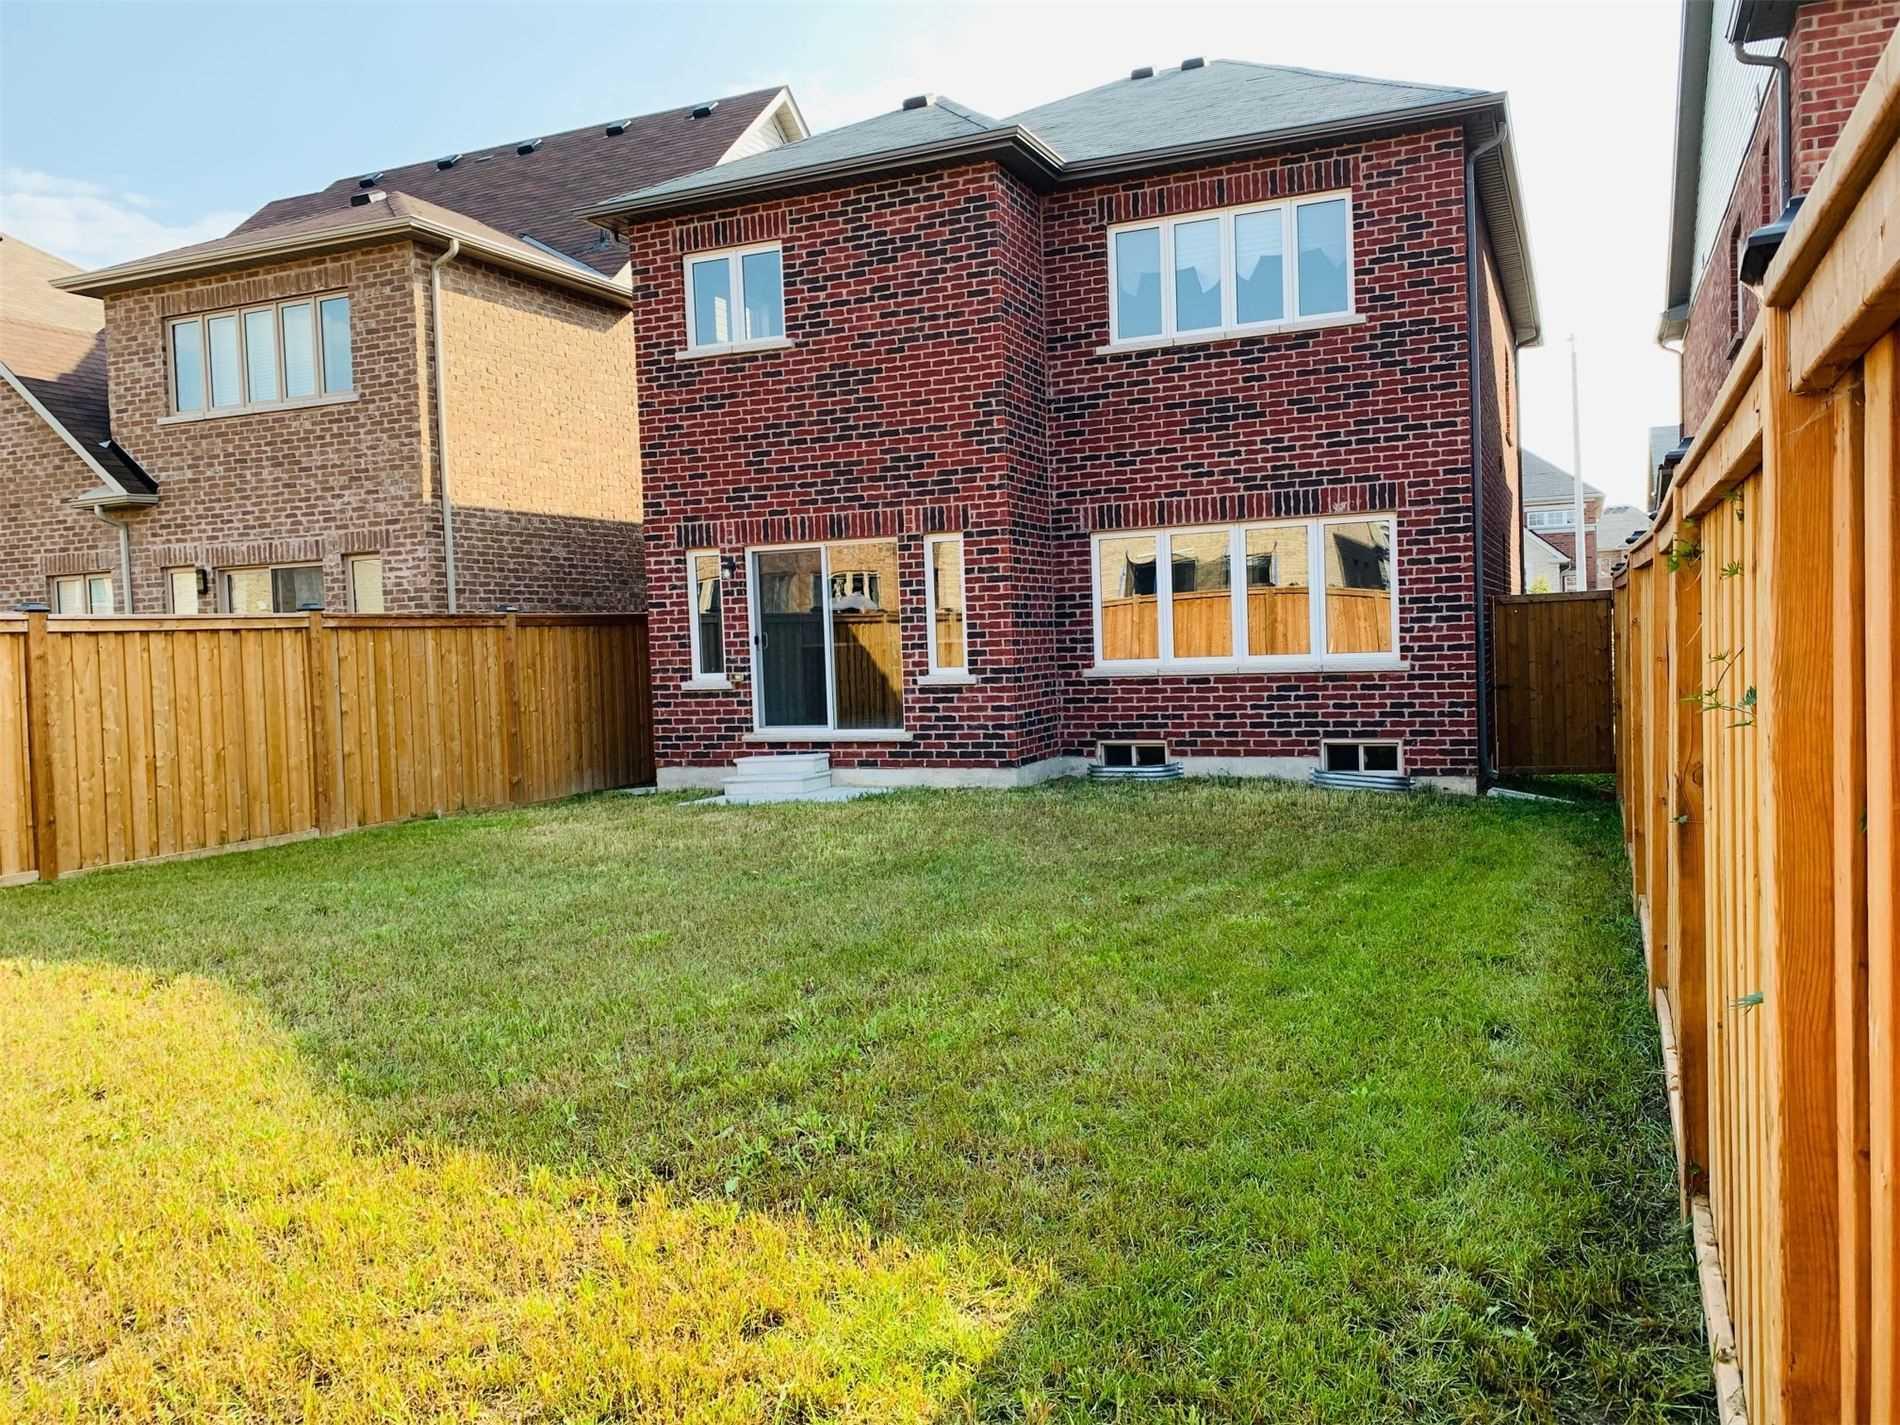 1445 Mcroberts Cres, Innisfil, Ontario L9S0J9, 3 Bedrooms Bedrooms, 7 Rooms Rooms,3 BathroomsBathrooms,Detached,For Sale,Mcroberts,N5352282